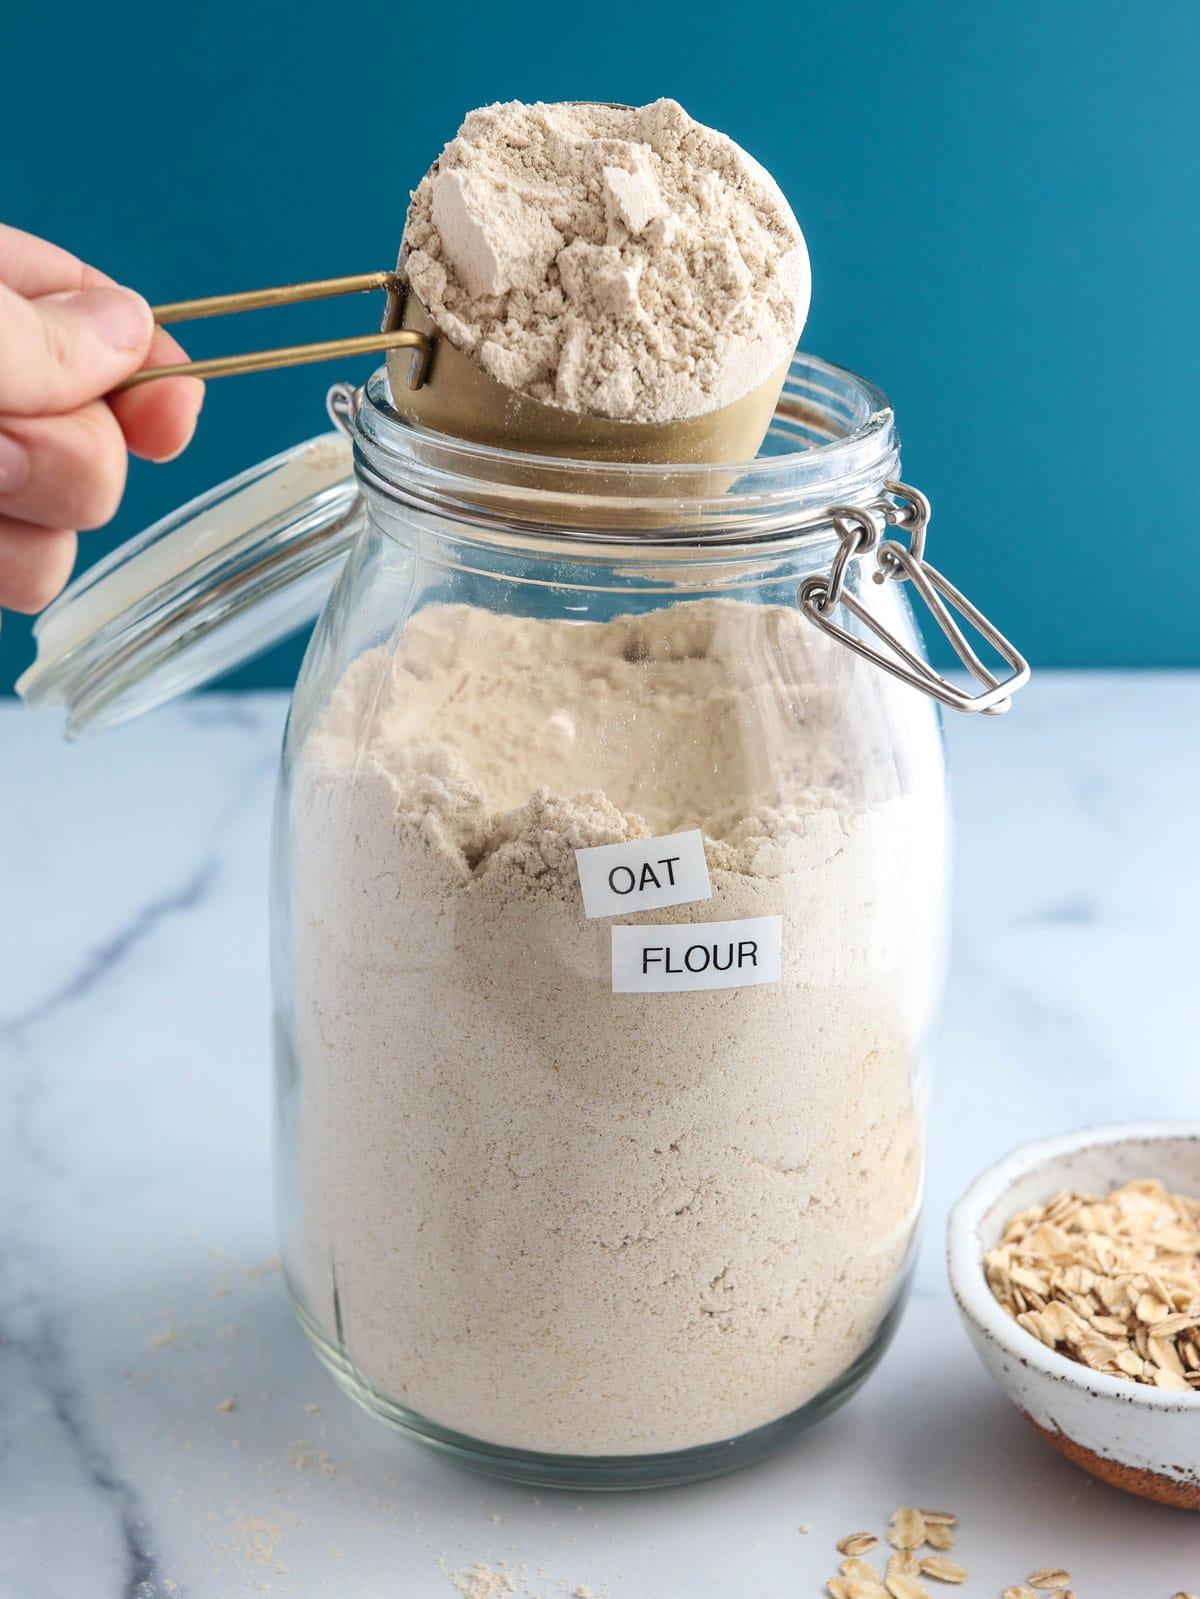 Oat Flour Replacement